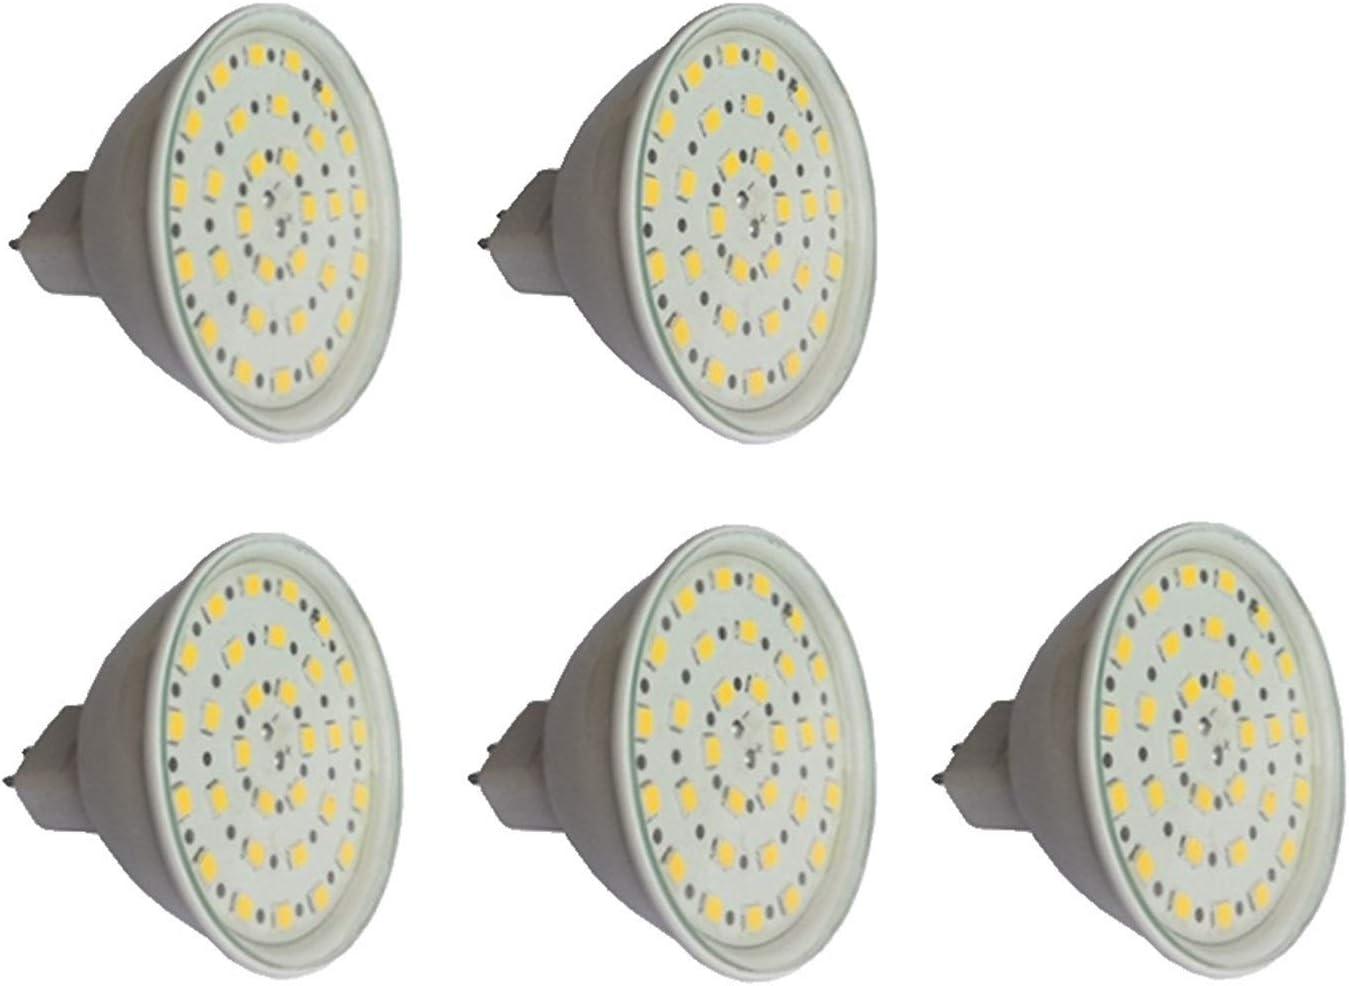 WELSUN MR16 LED Bombilla 24v, GU5.3 Bi-Pin Base, 6-Watt (50 vatios Equivalente), 450-500 Lumen, 24-40V Lámparas LED AC/DC Taza Blanca con Cubierta for el Glass [Clase energética A ++] 5-Pack